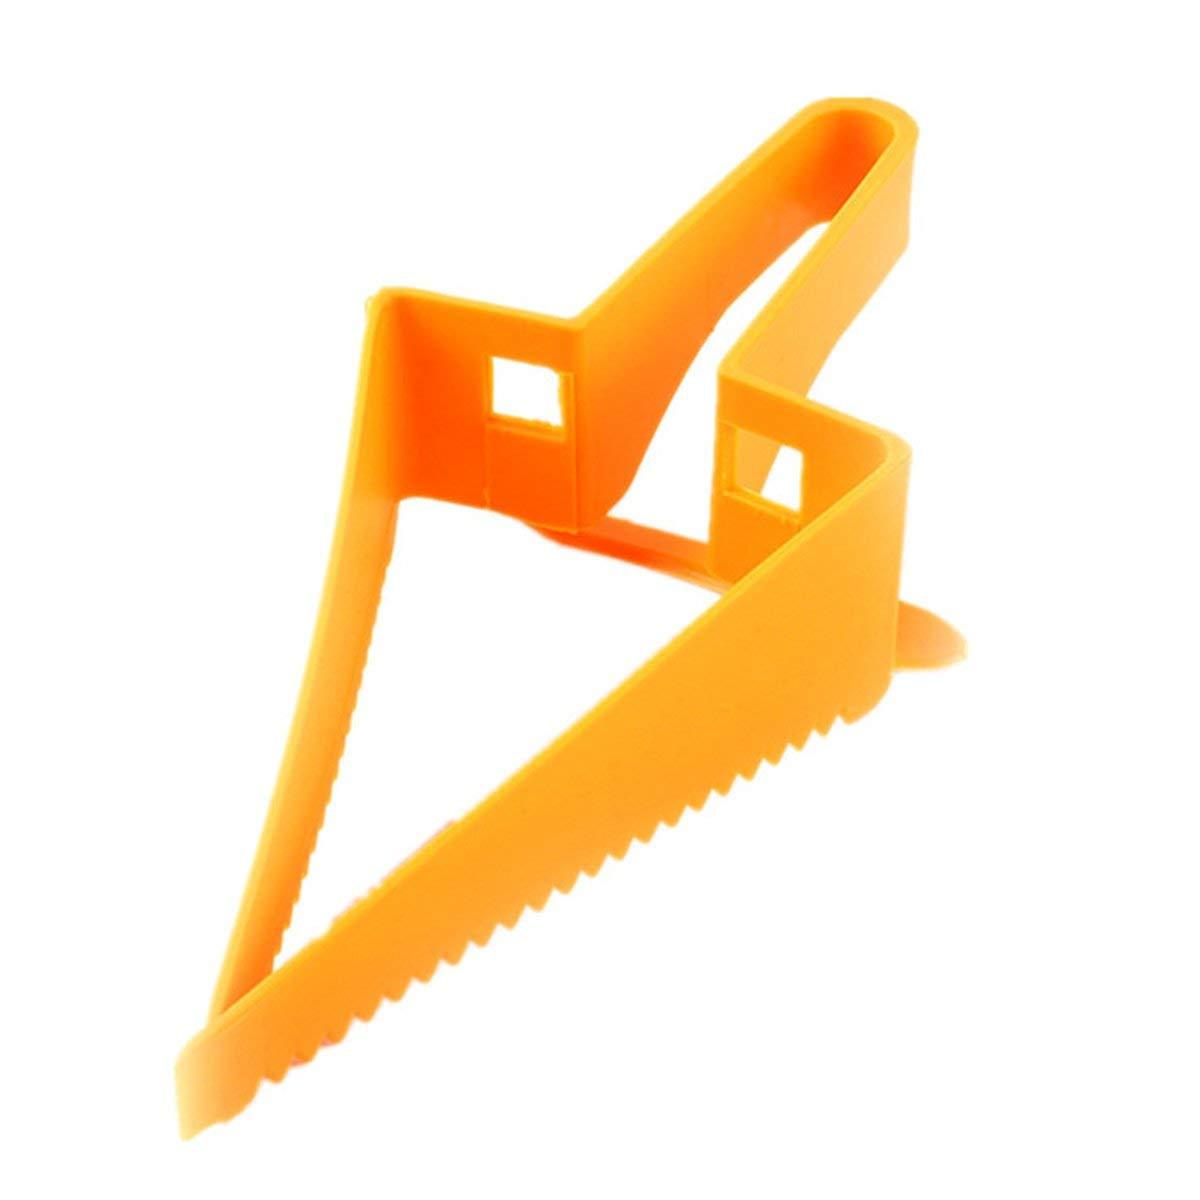 TOOGOO Triangle-Design Adjustable Cake Cutter Baking Tool Cake Slicer Baking Cutter Tool